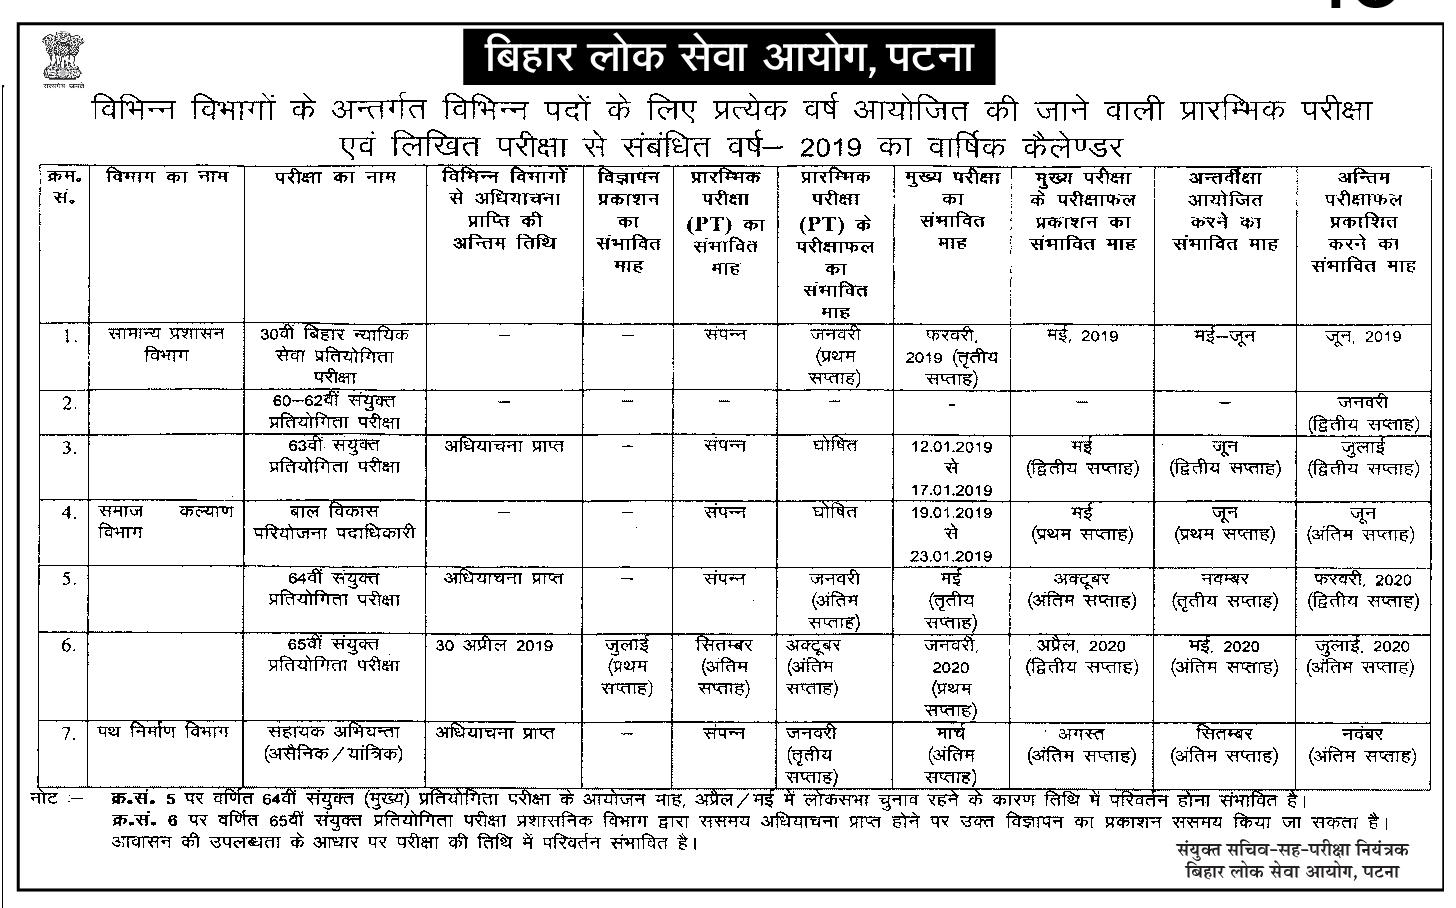 Bpsc Exam Calendar 2019  Vision regarding 2020 Calendar Bihar